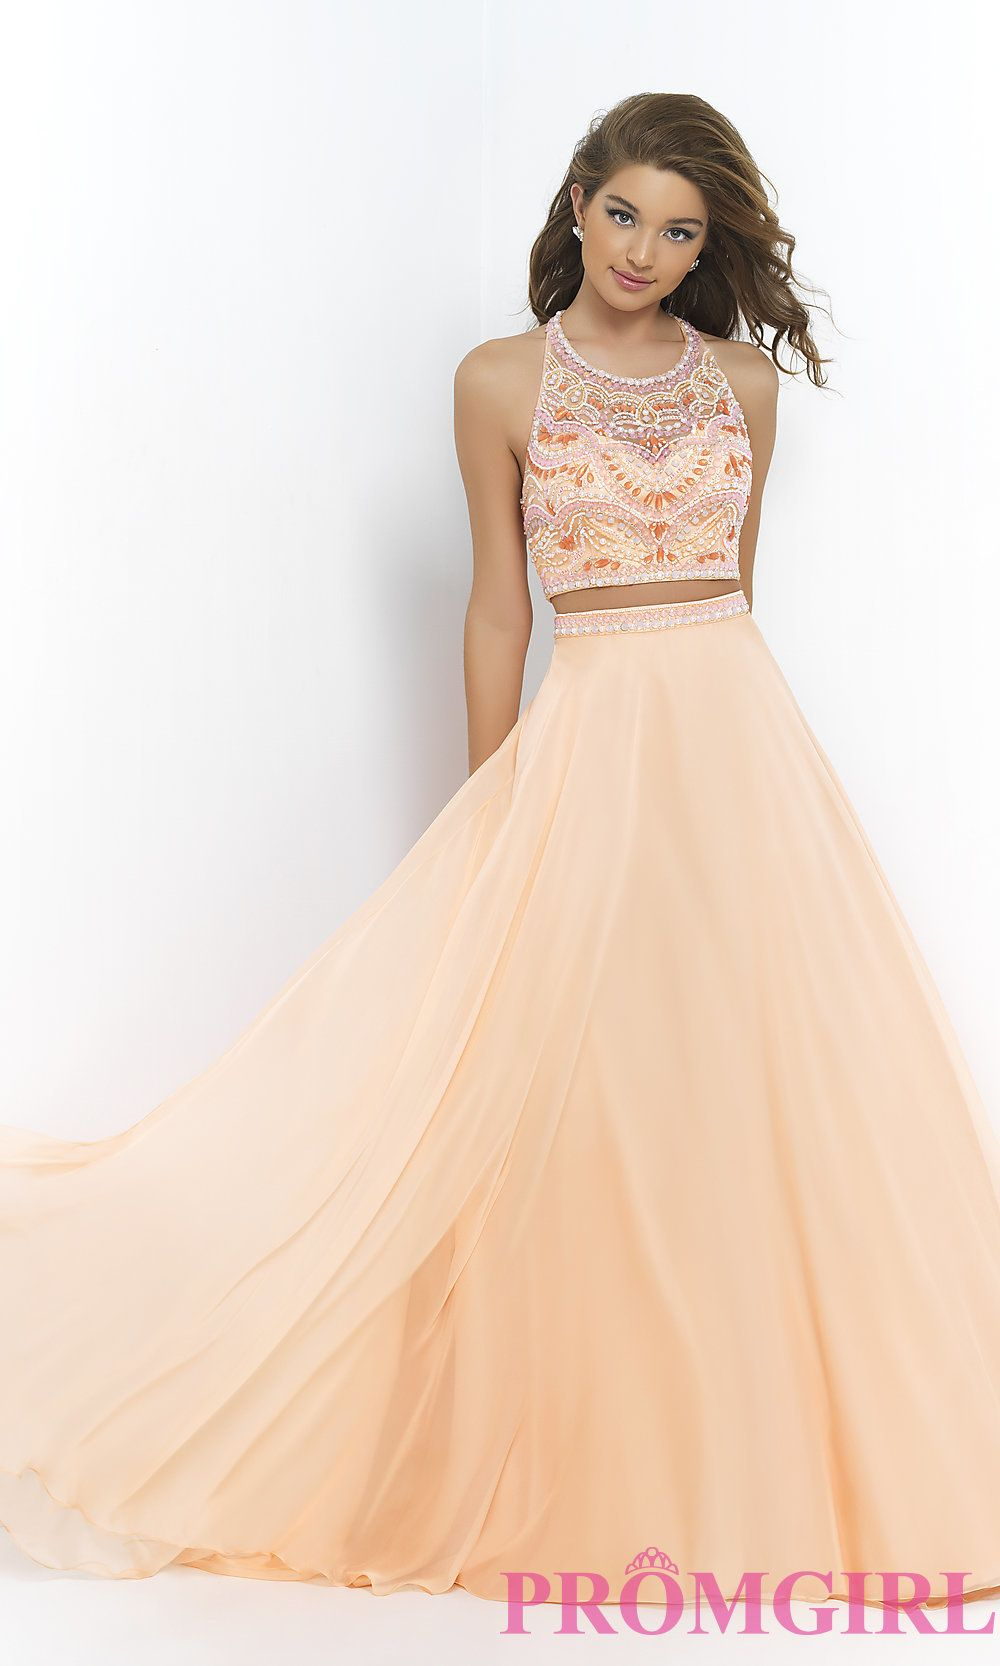 Prom Dresses, Plus Size Dresses, Prom Shoes -PromGirl : Blush Two ...